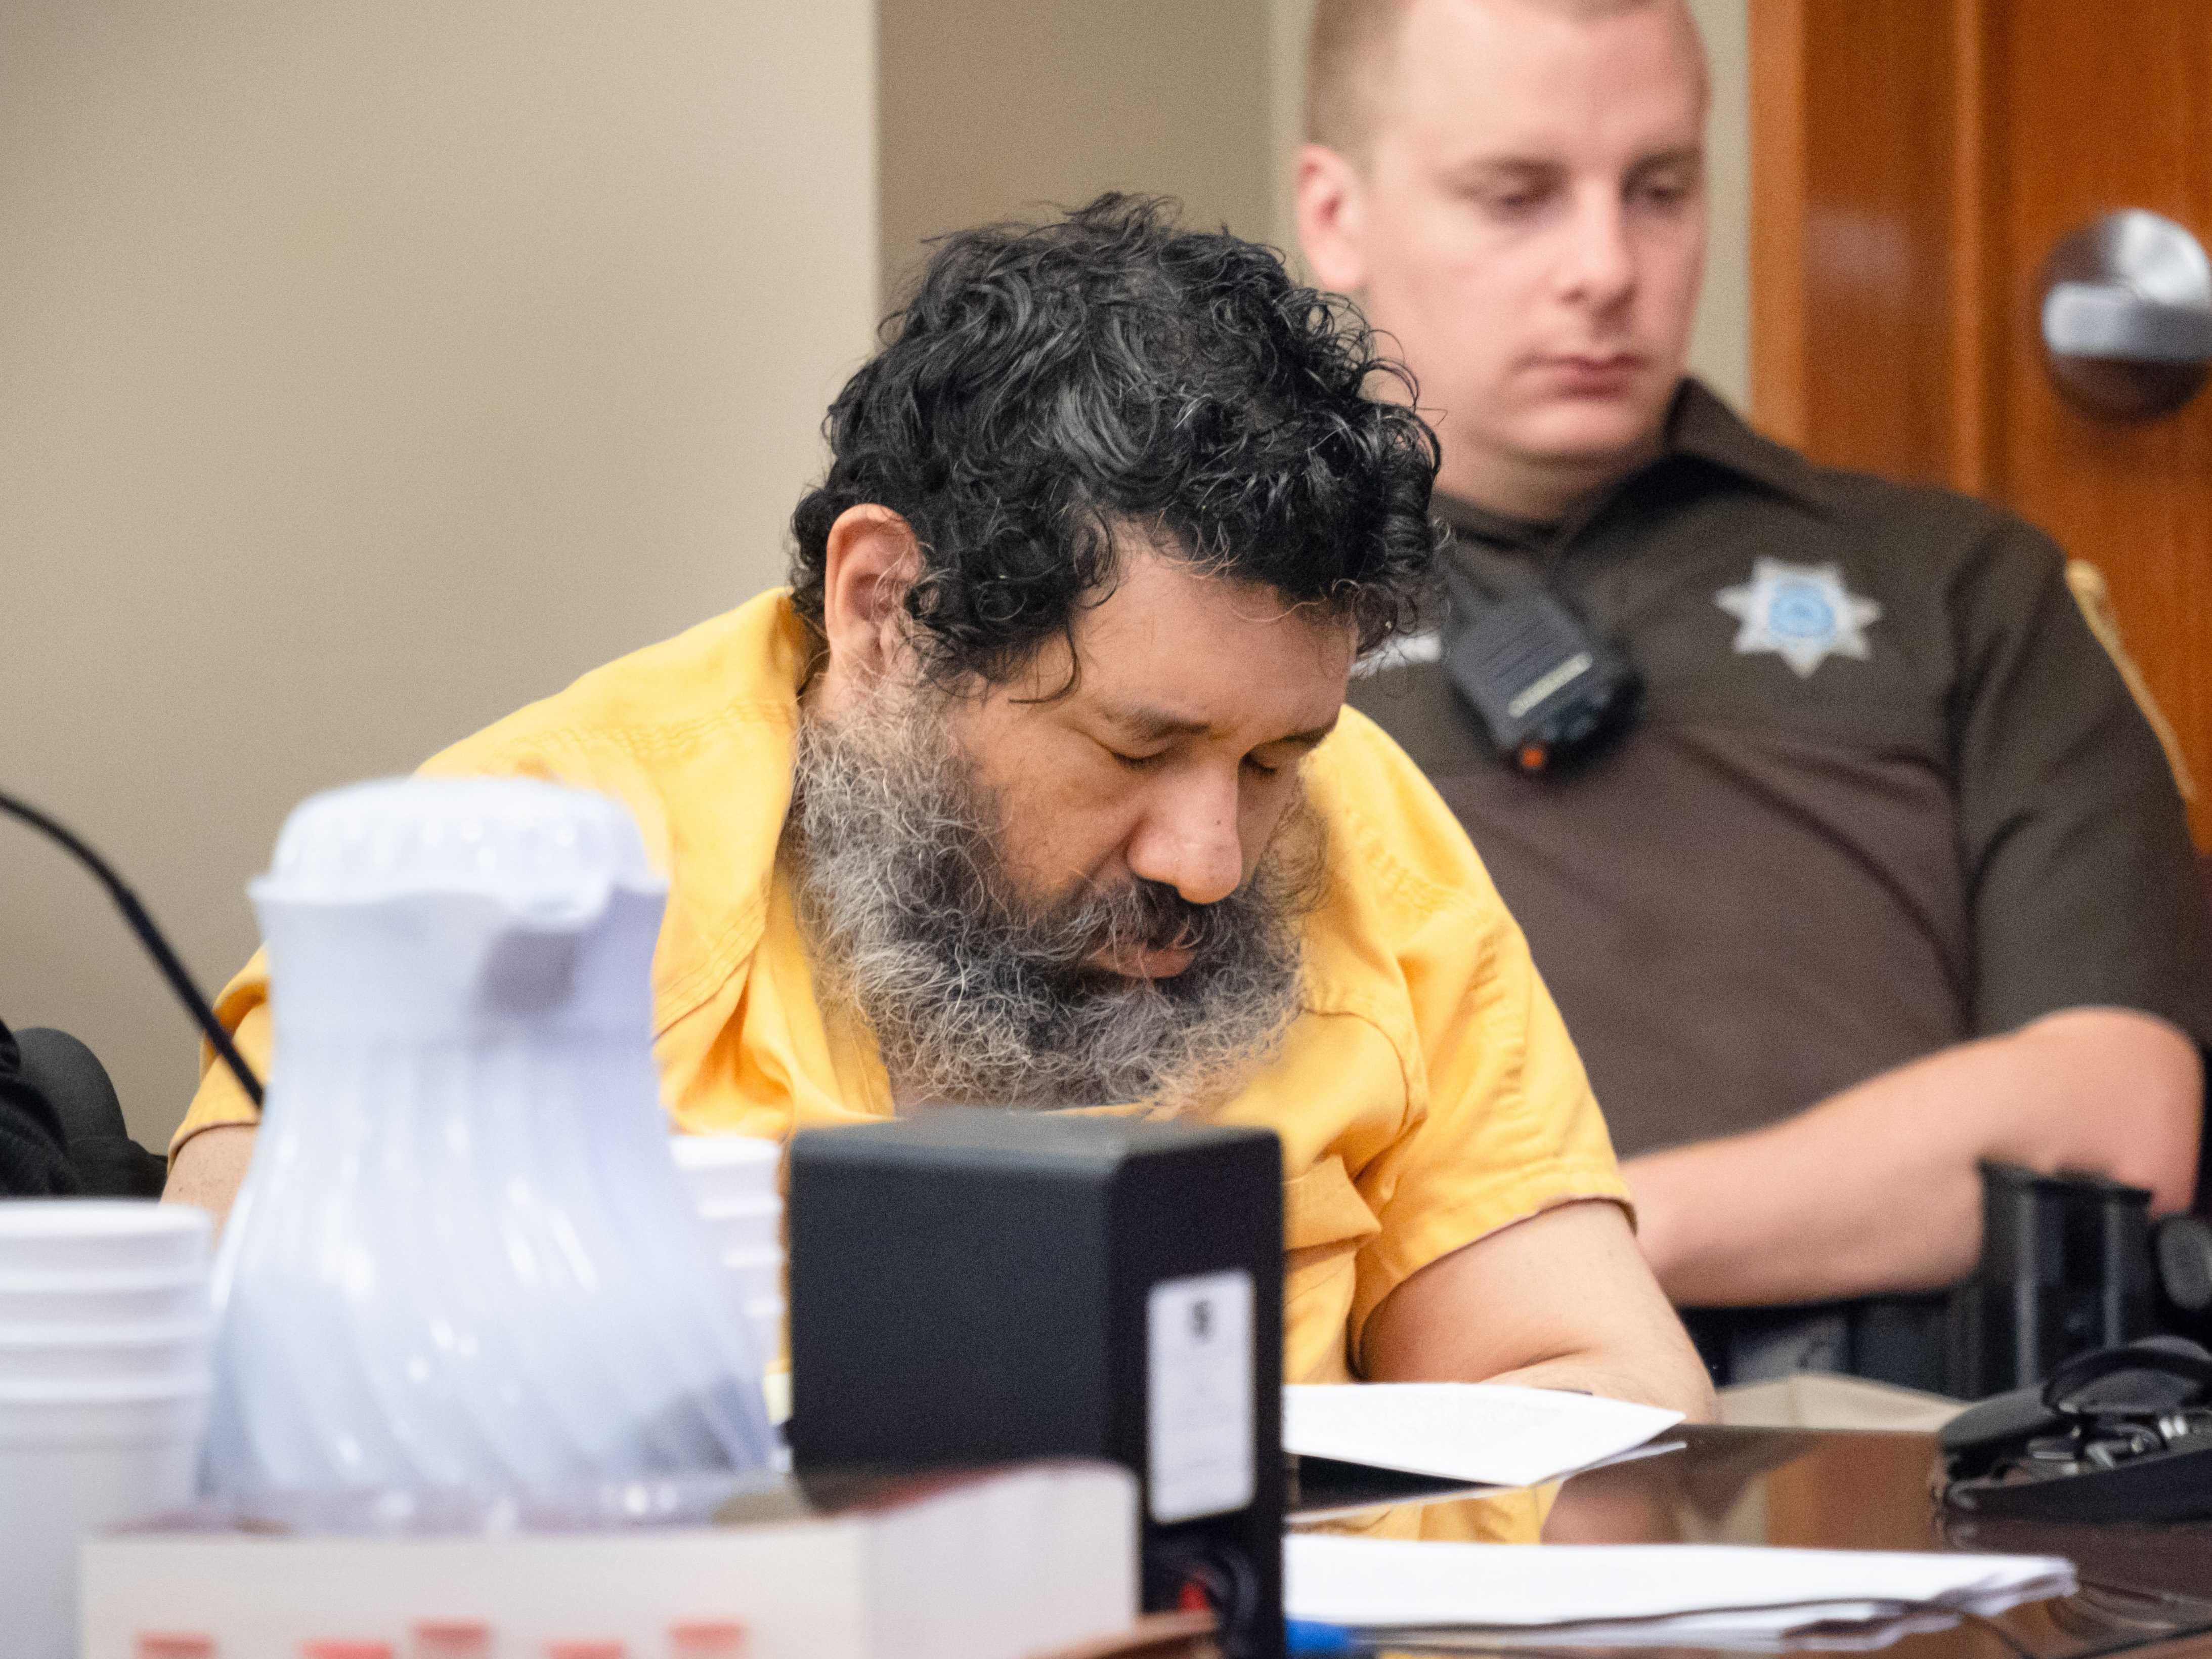 Death Sentence For Ex-Doctor Who Killed 4 People In Nebraska